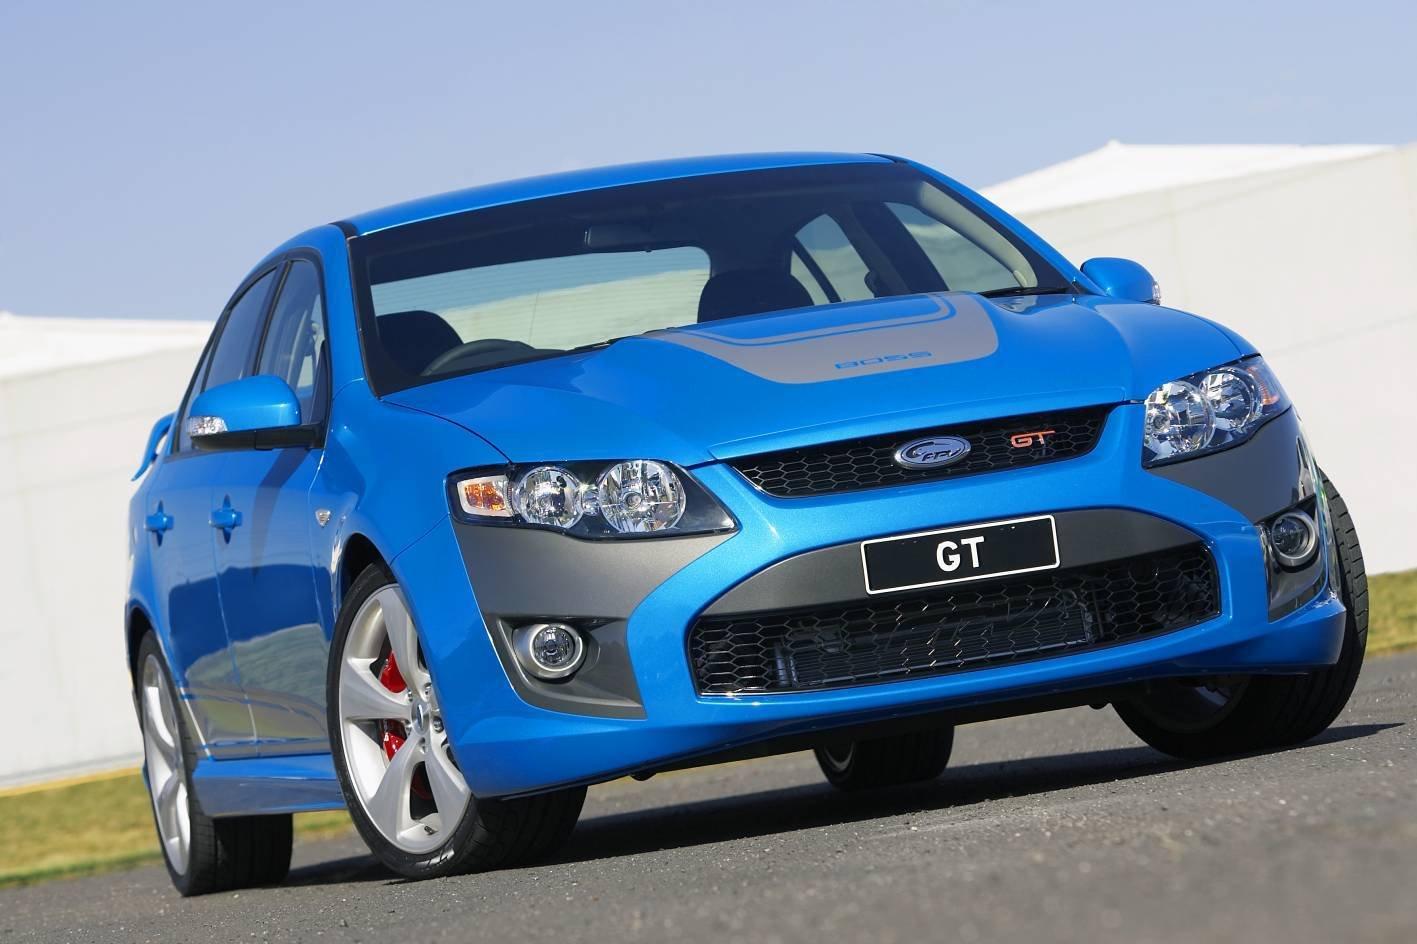 Australia U2019s Ford Performance Vehicle Division Closing Next